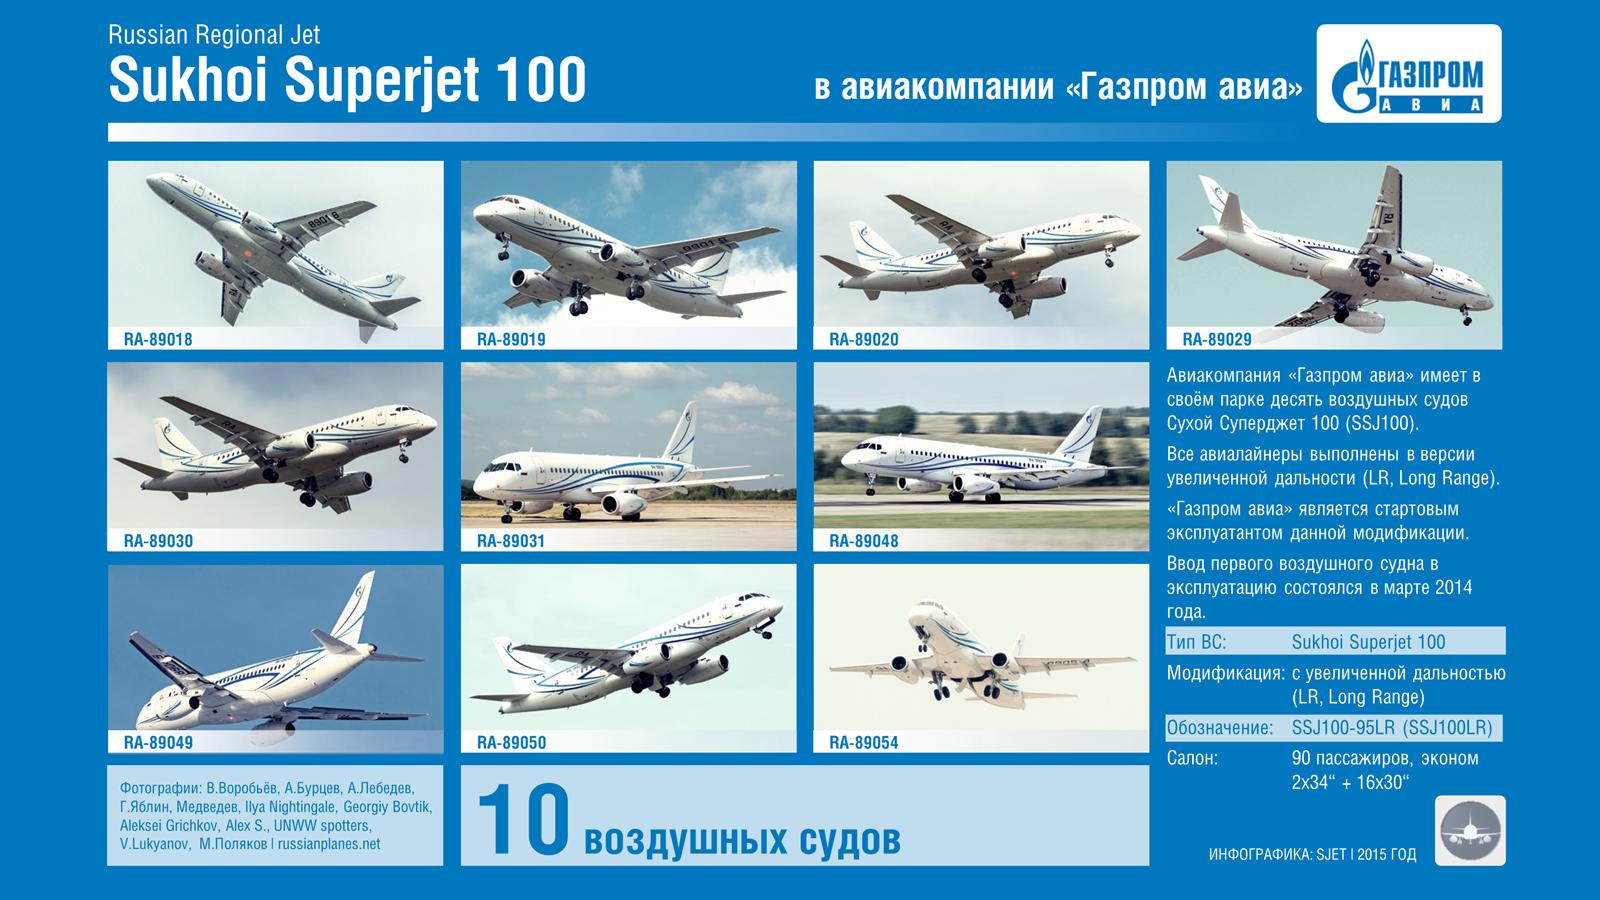 Sukhoi%20Superjet%20SSJ100%20Gazprom%20avia%20fleet.png